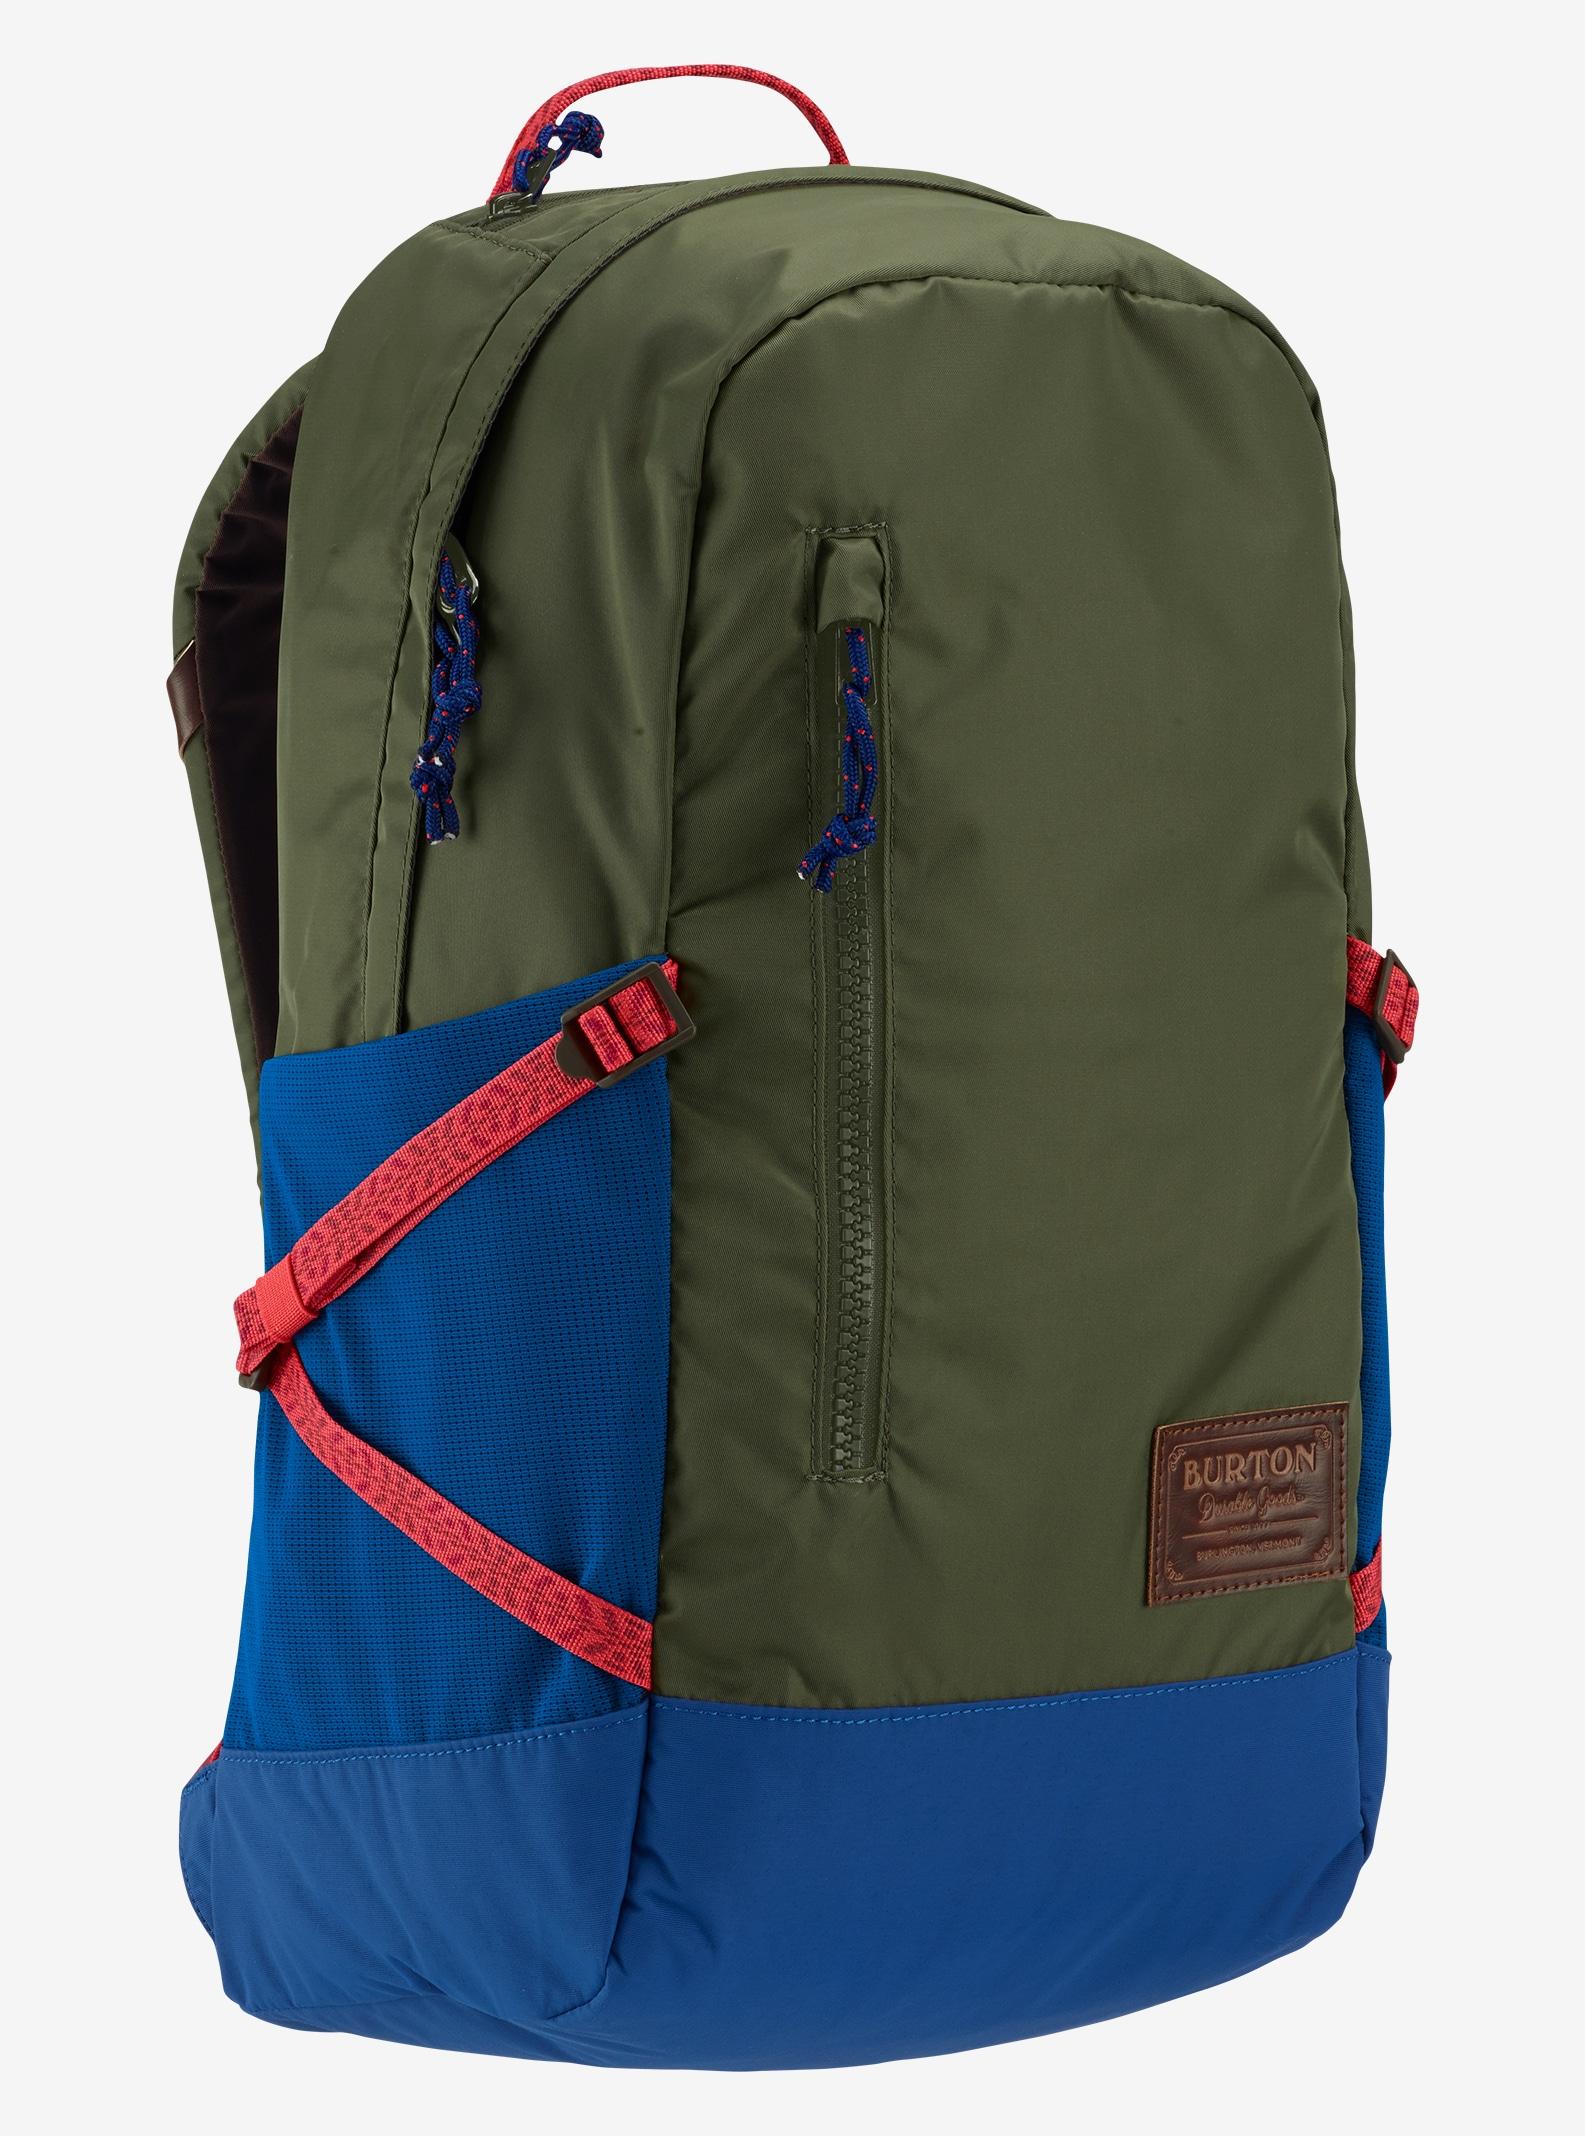 Burton Women's Prospect Backpack shown in Lichen Flight Satin